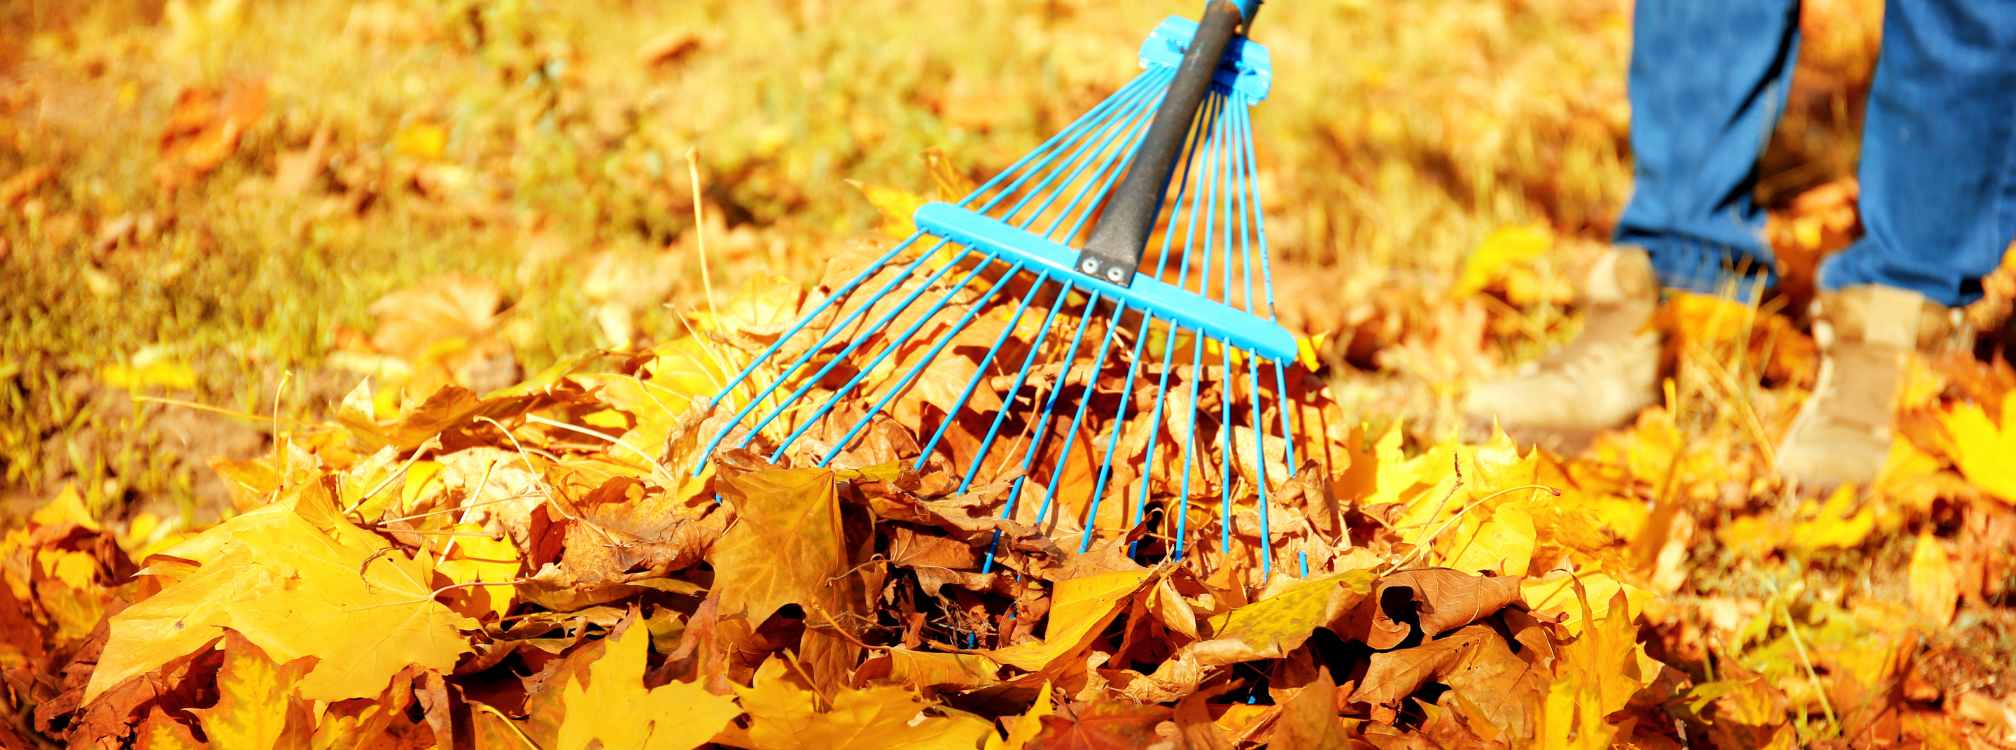 Fall Clean Up November 6-13th